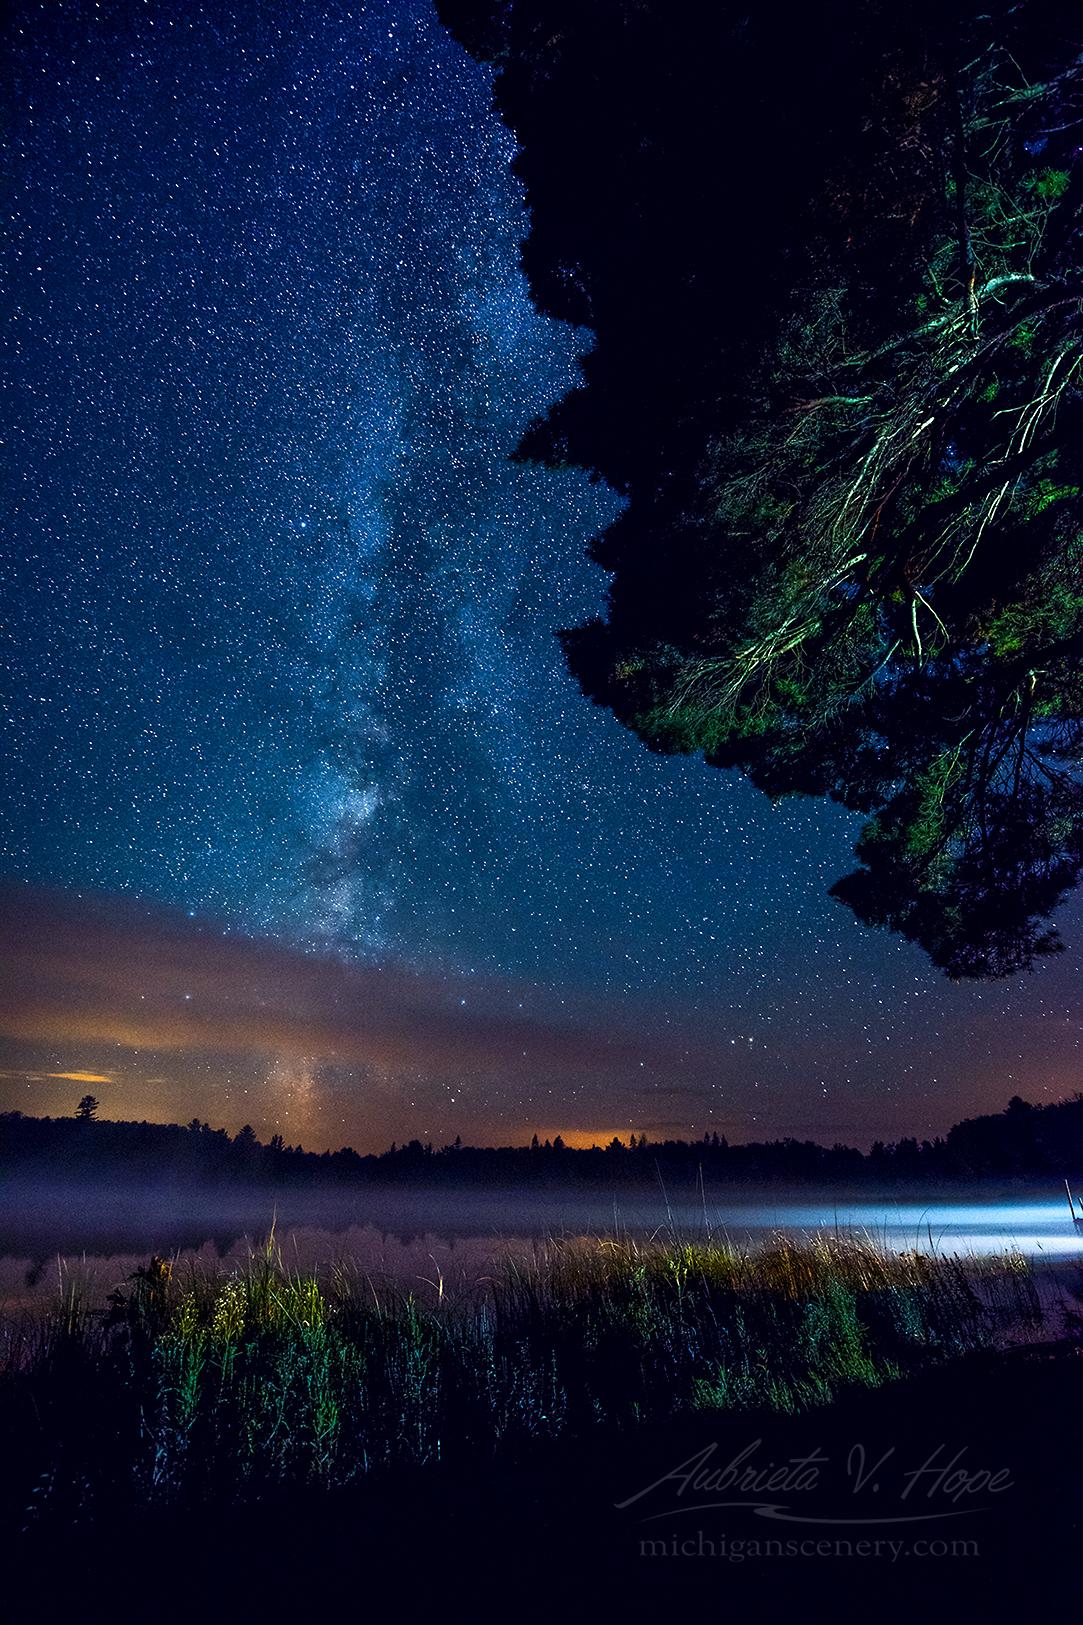 MI17-0973-6198 Milky Way at Otter Lake by Aubrieta V Hope Michigan Scenery .jpg